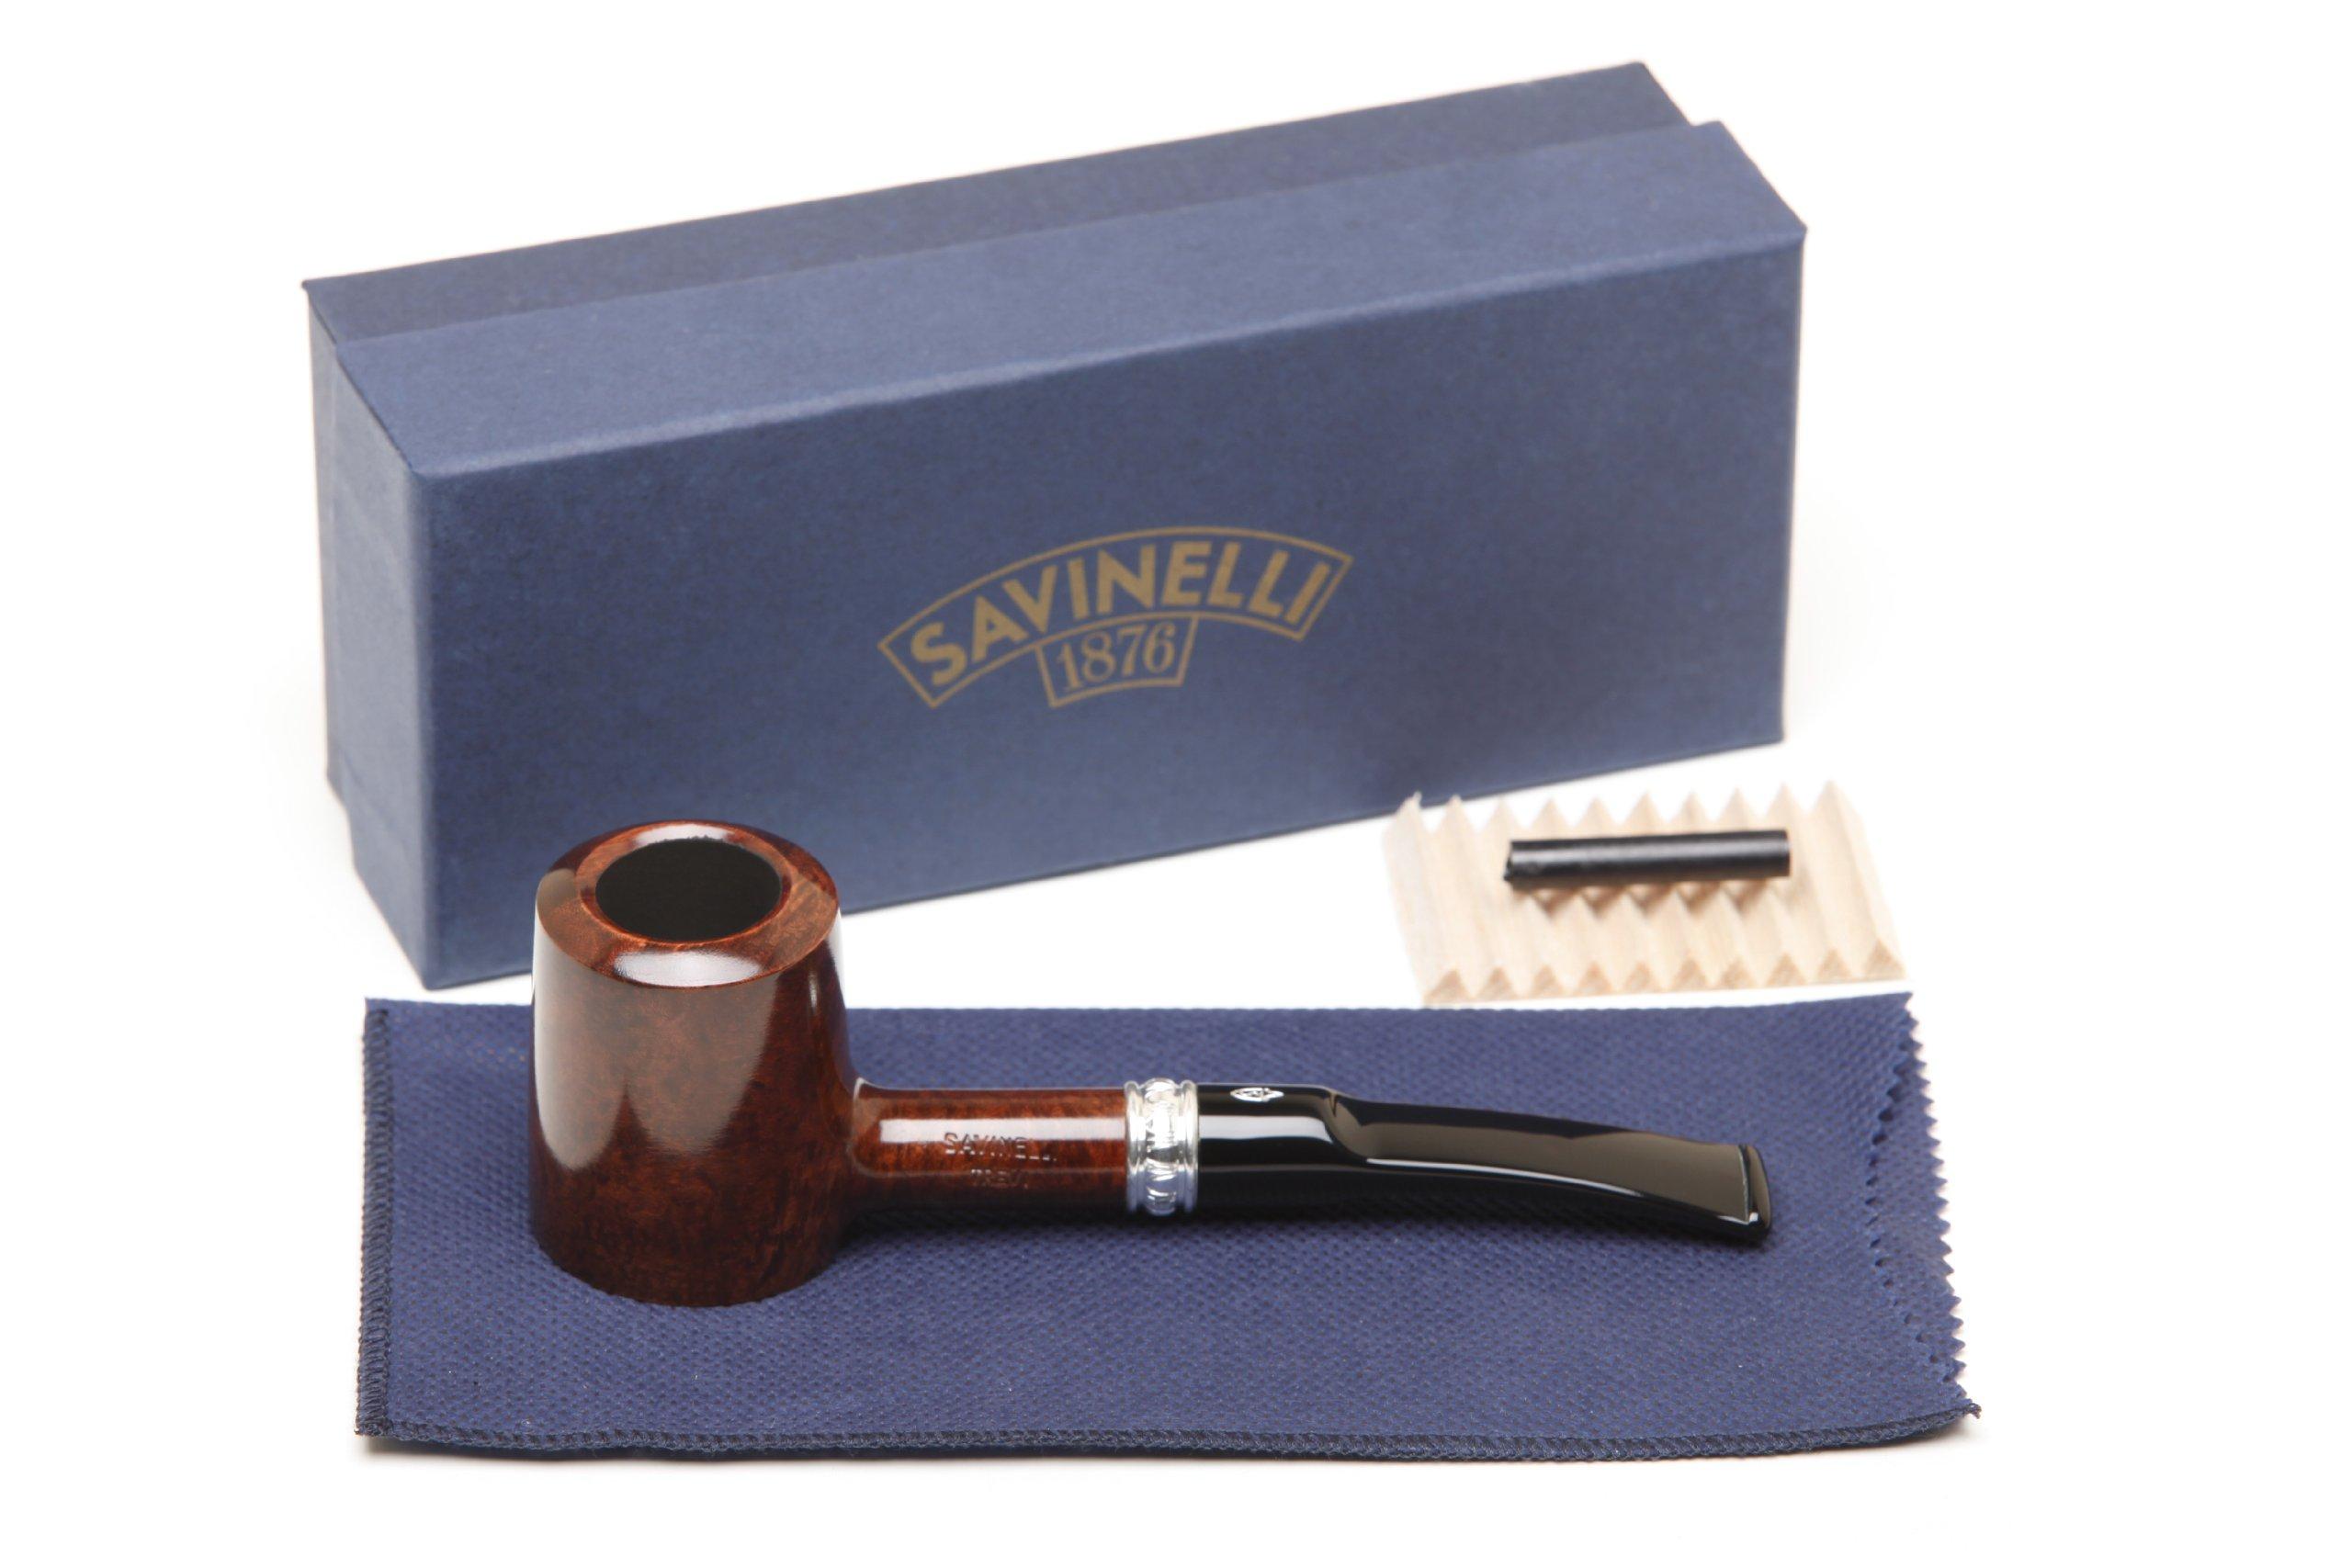 Savinelli Trevi Smooth 310 KS Tobacco Pipe